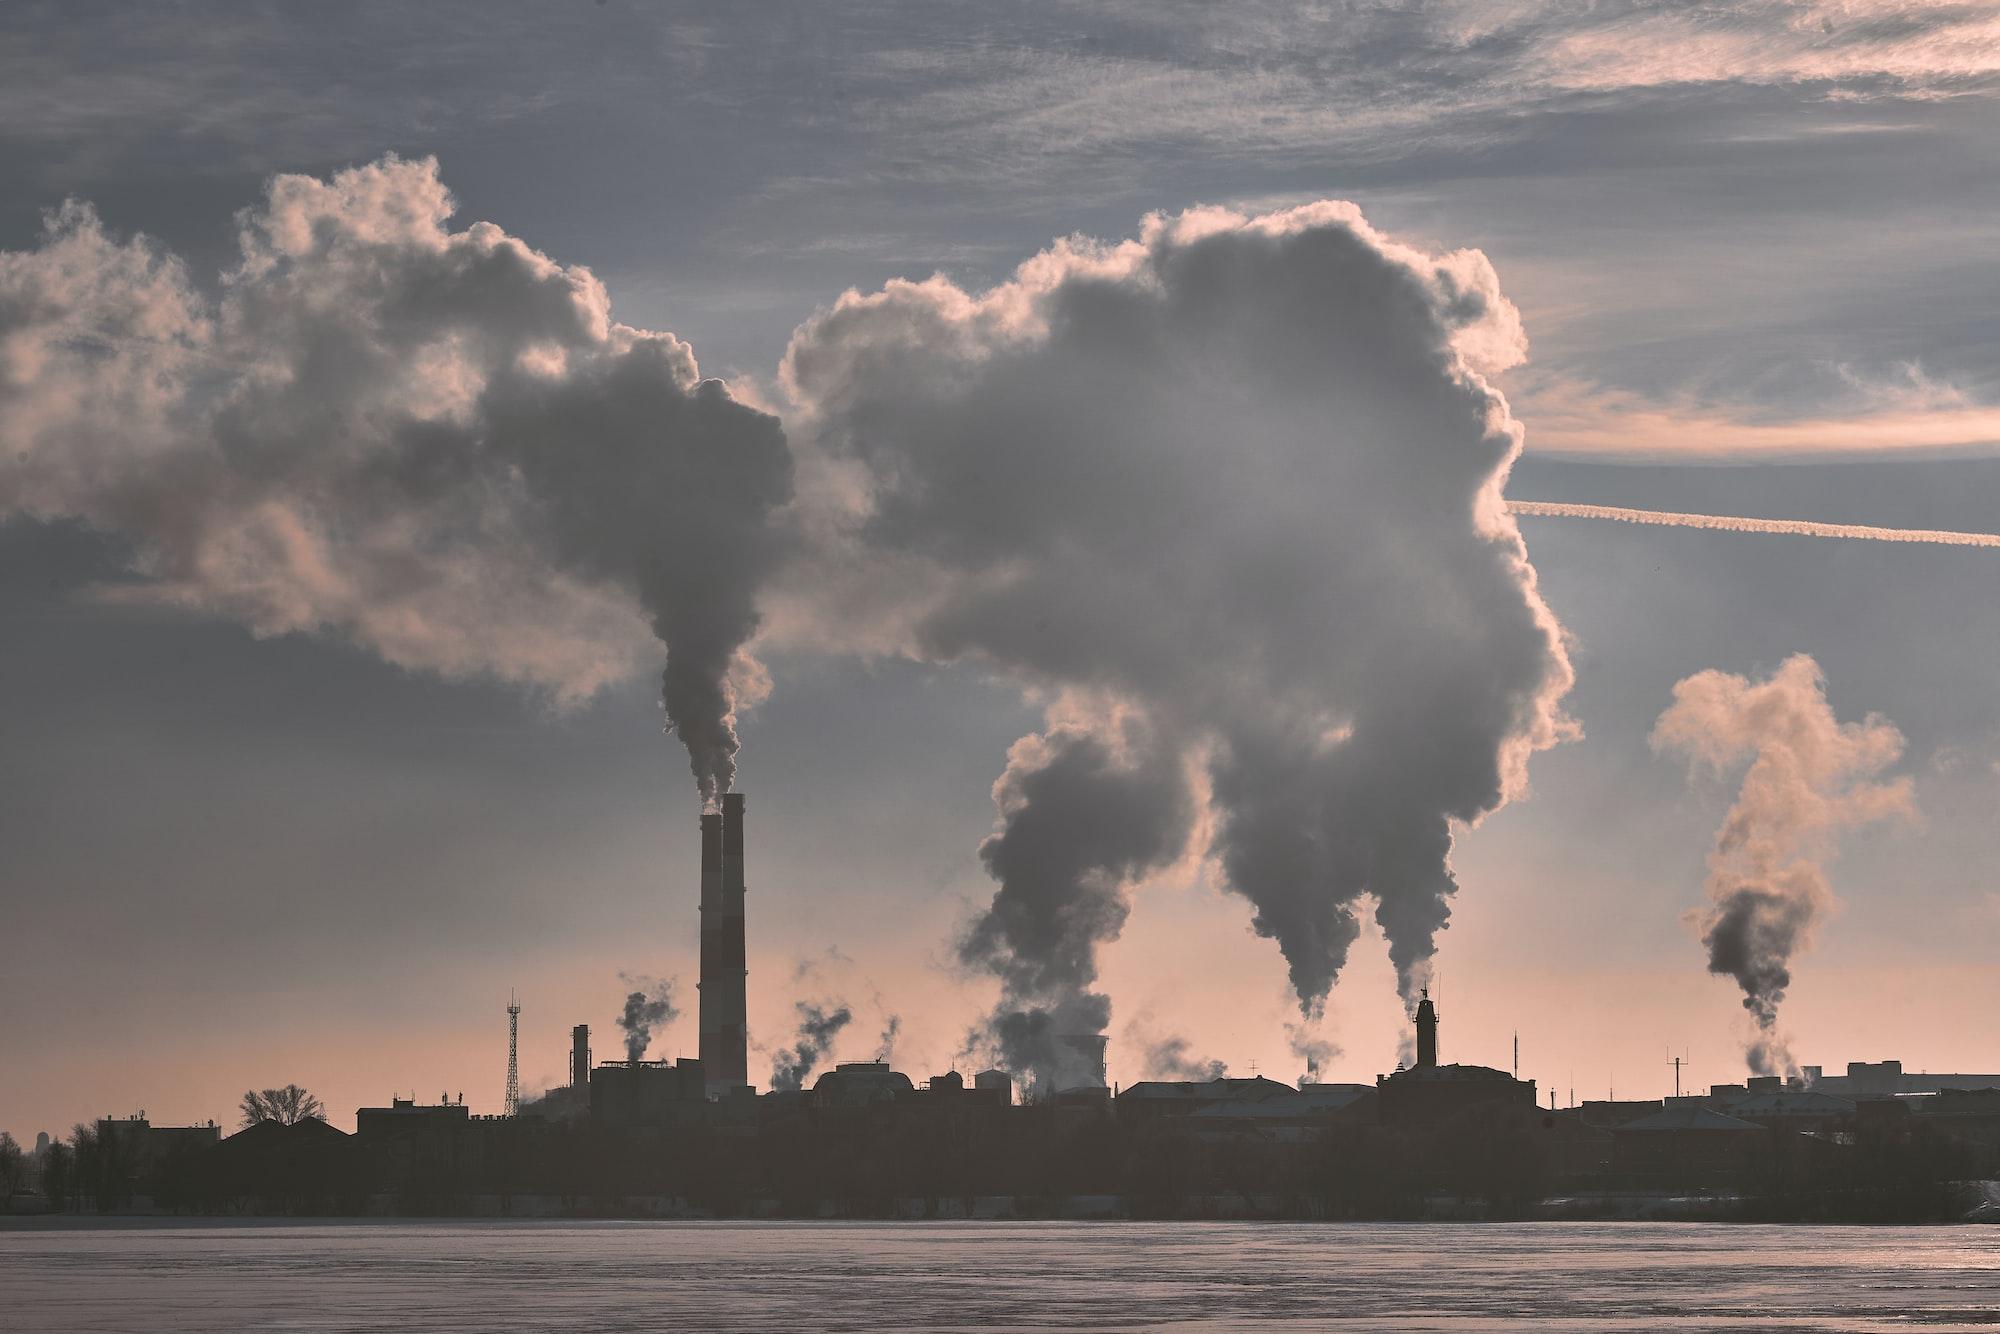 A breath of fresh air: BreezoMeter raises $30M to predict environmental hazards